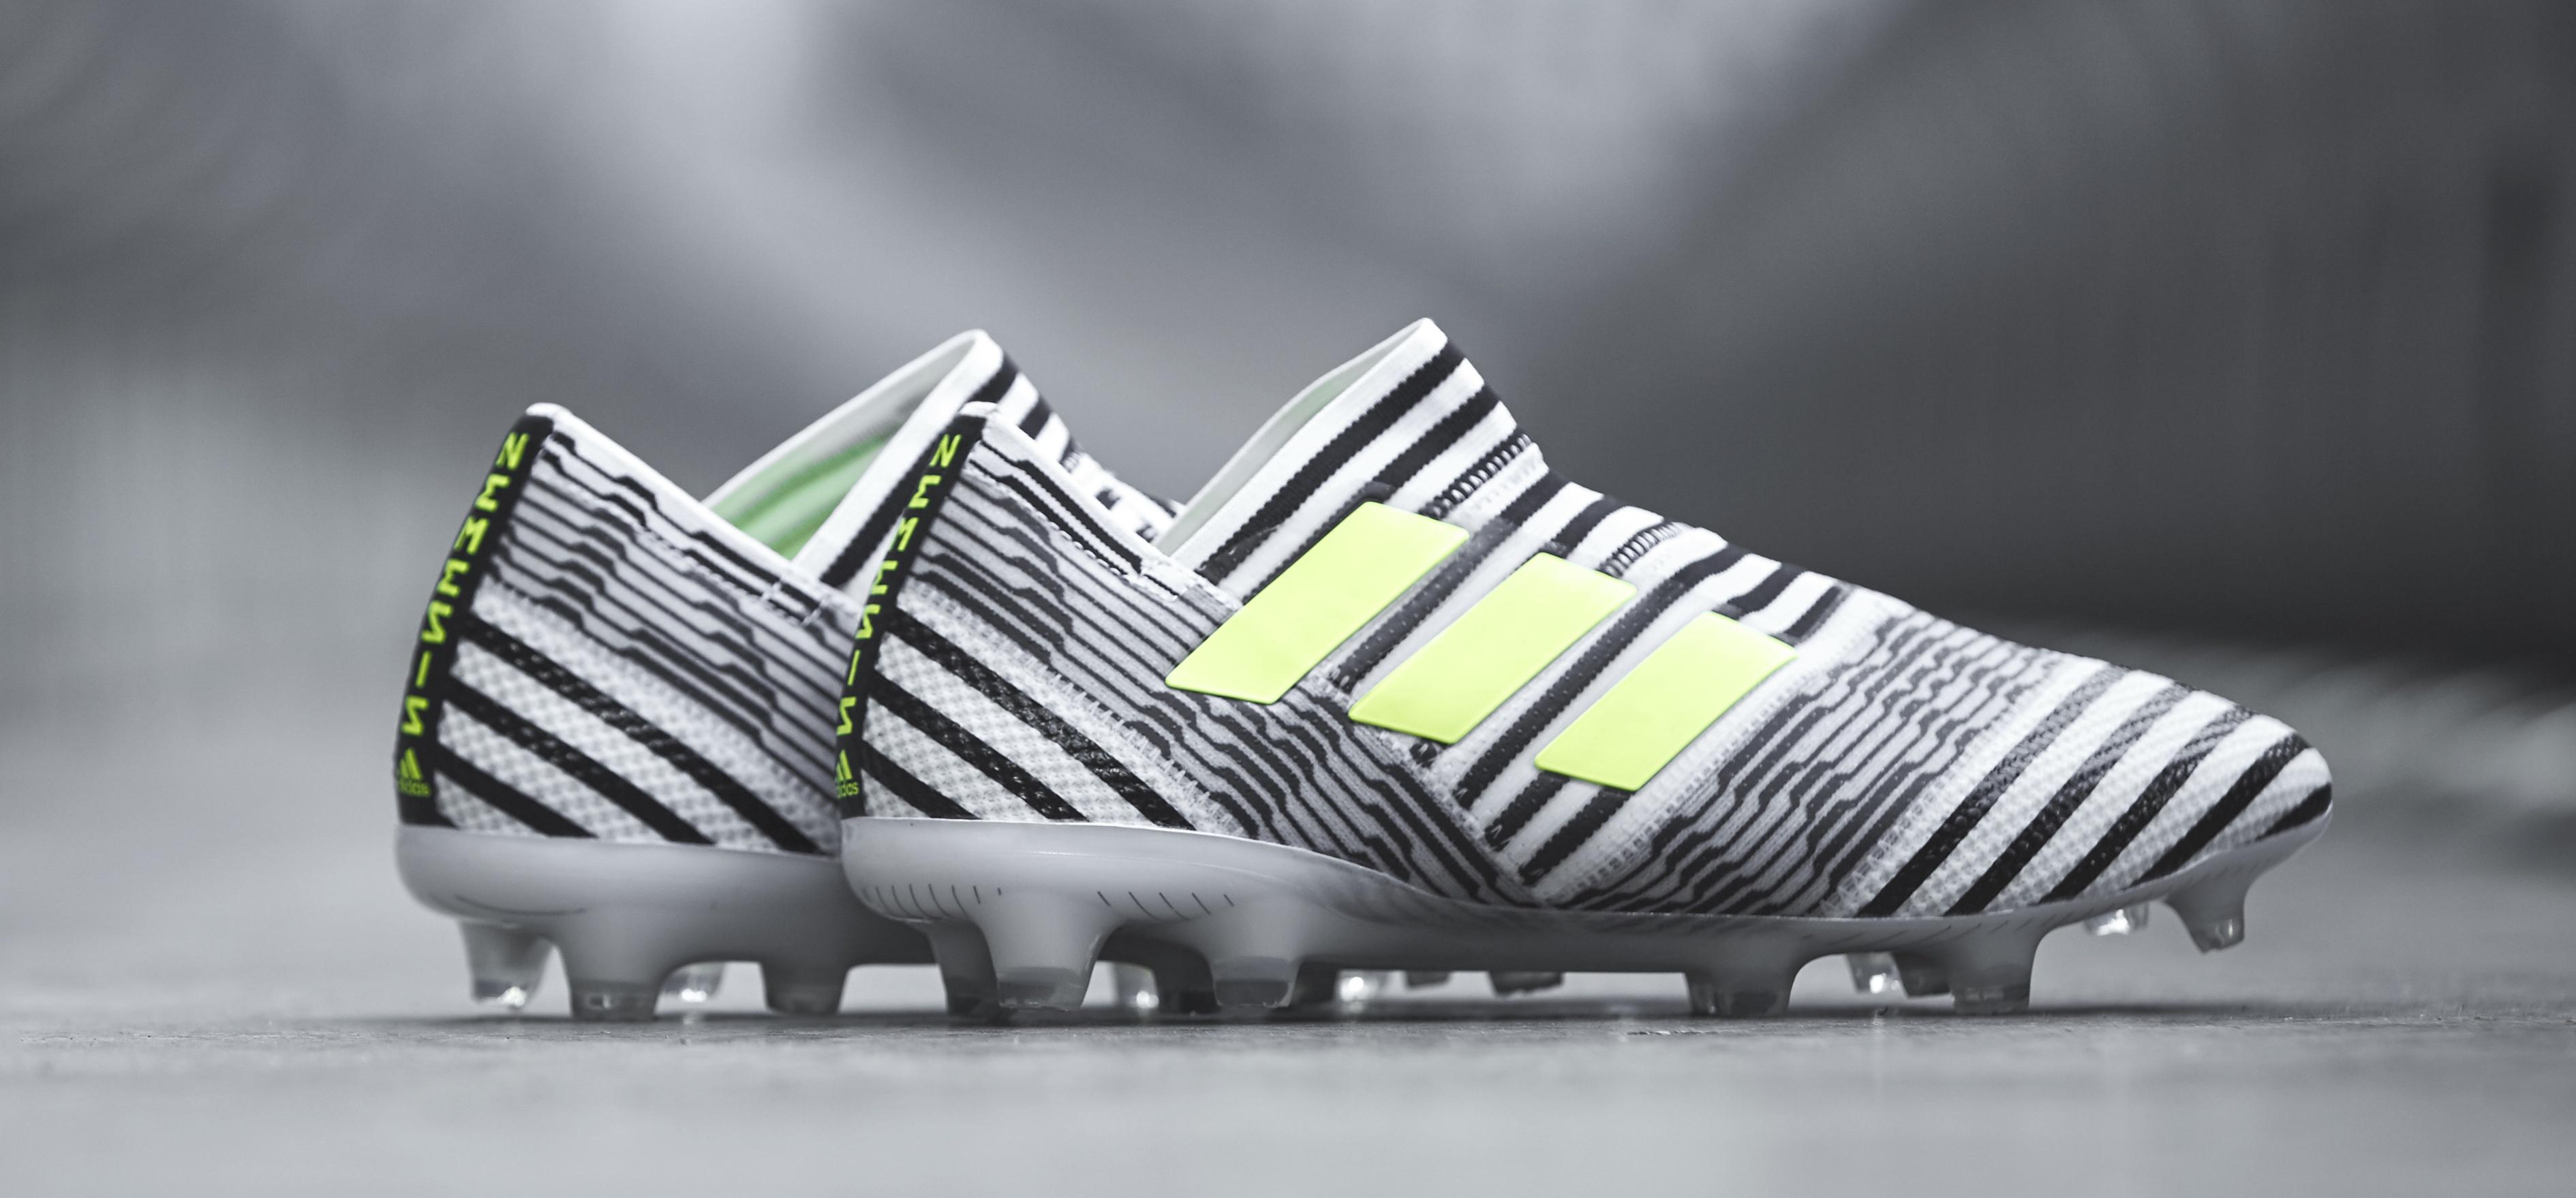 adidas Nemeziz black and white 1